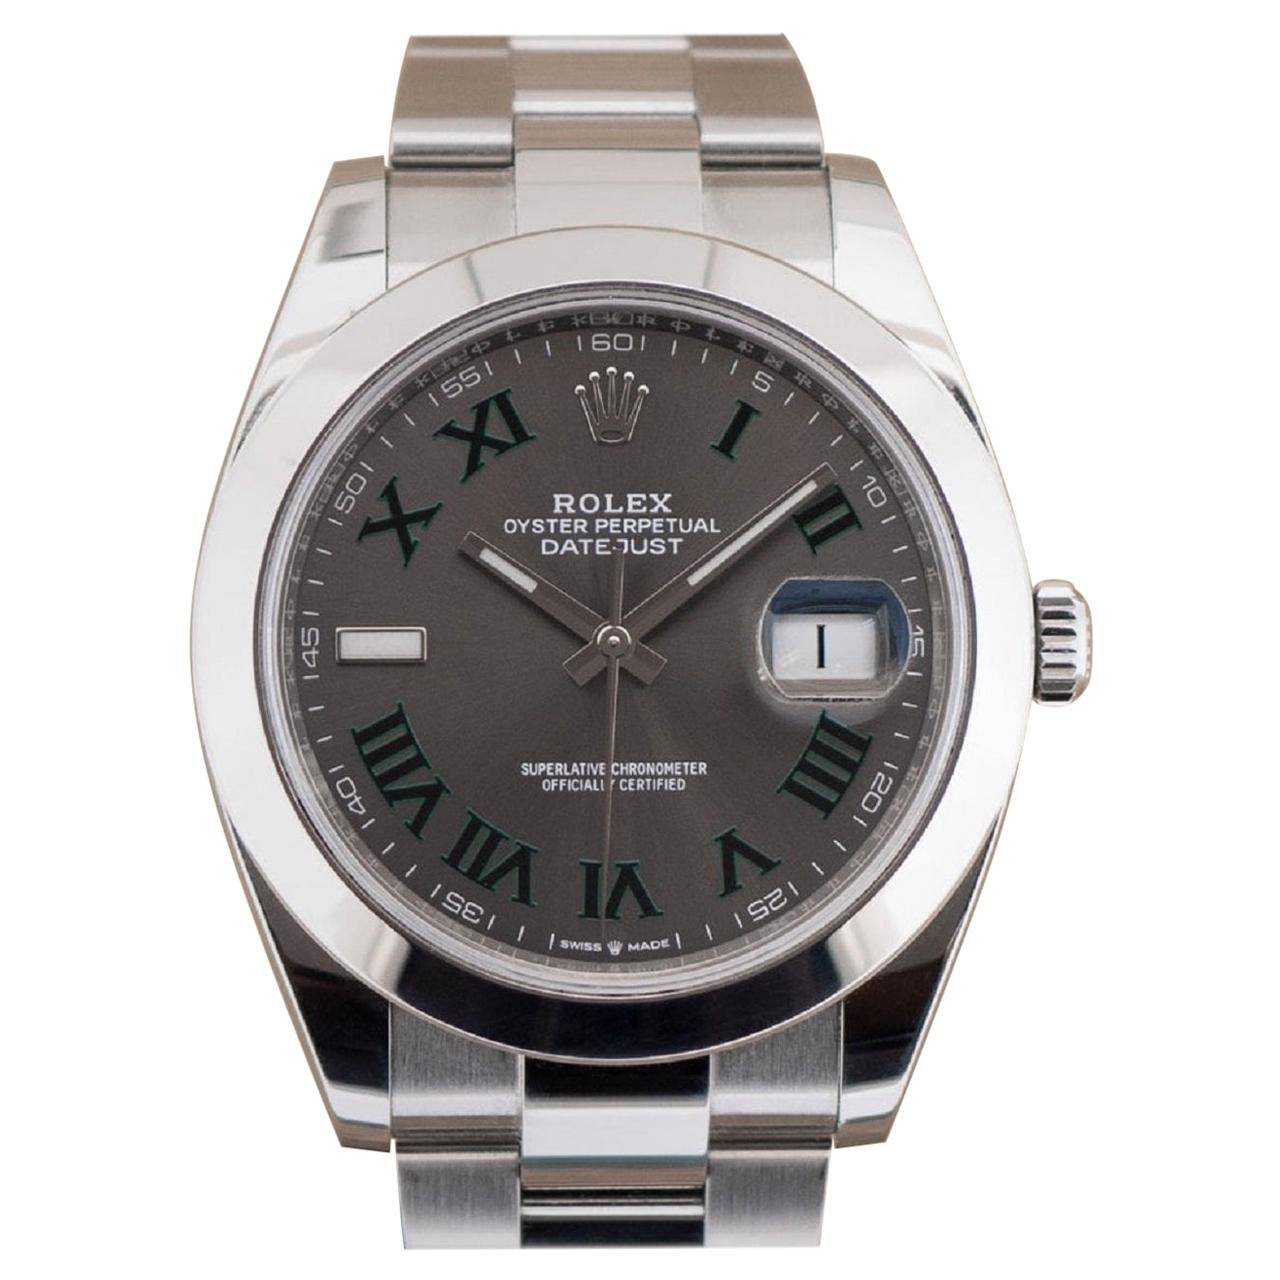 Rolex Wimbledon Datejust Oyster Bracelet Model 126300